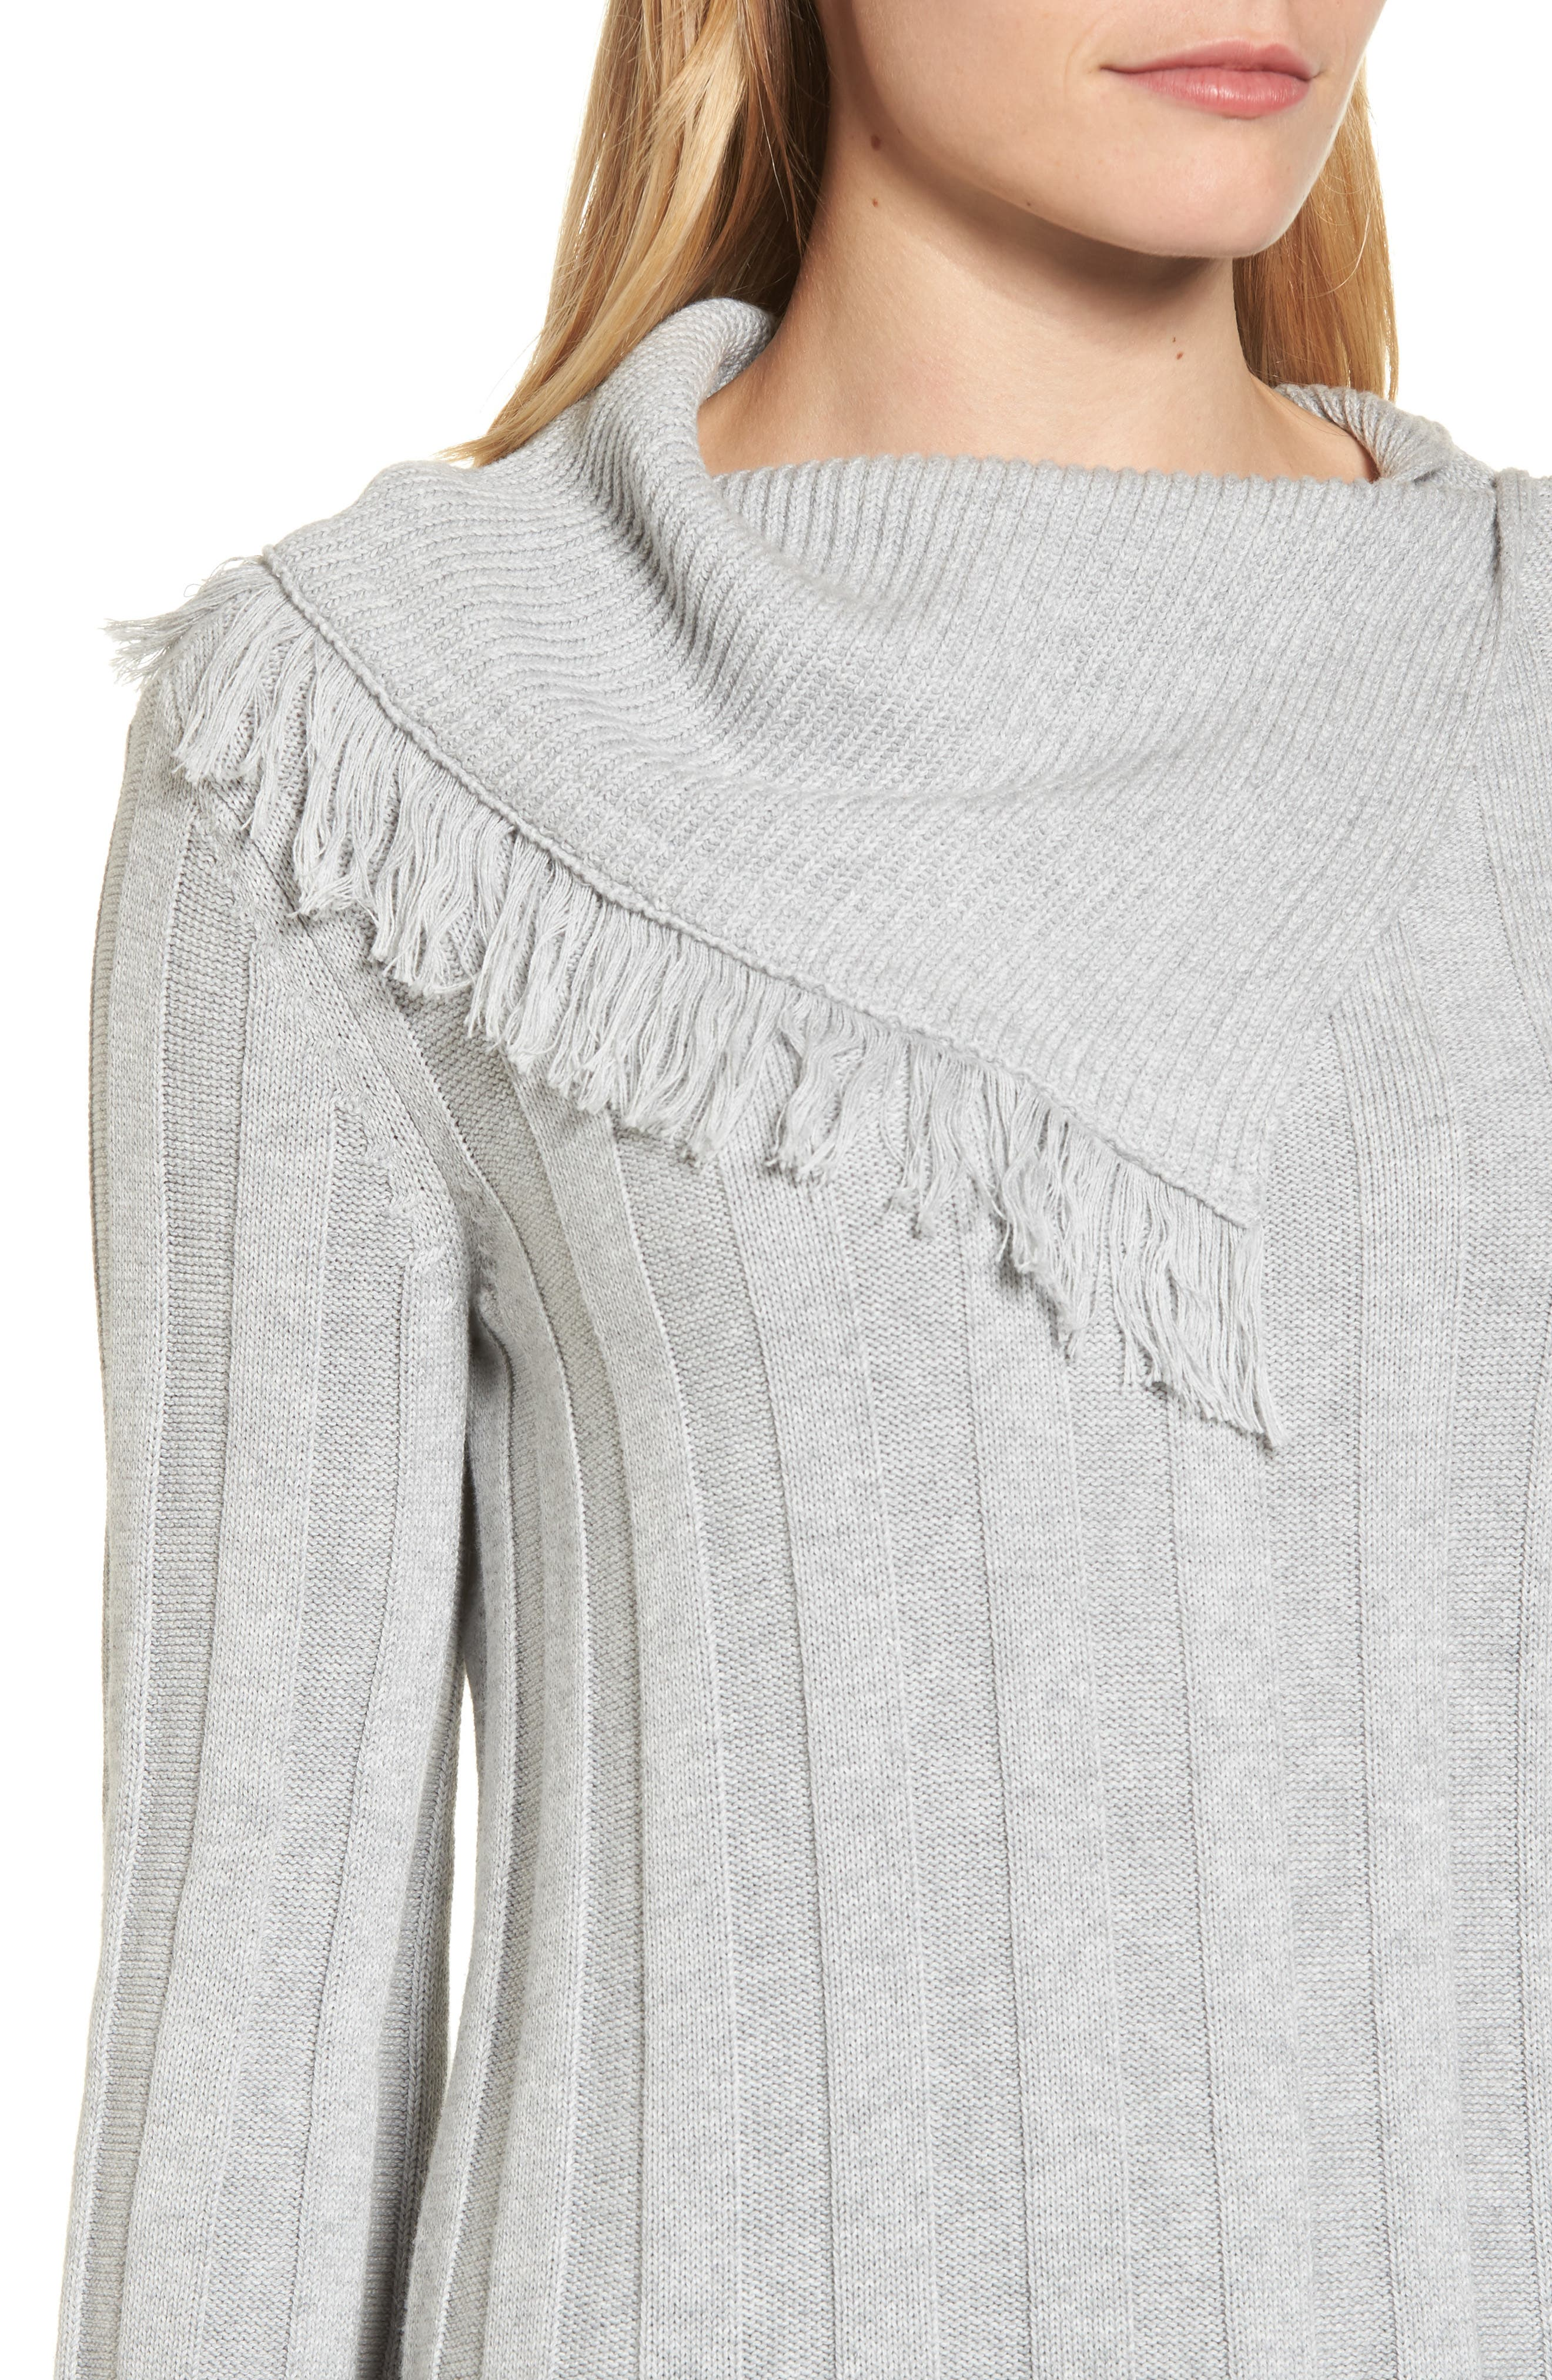 Fringe Cowl Neck Sweater,                             Alternate thumbnail 11, color,